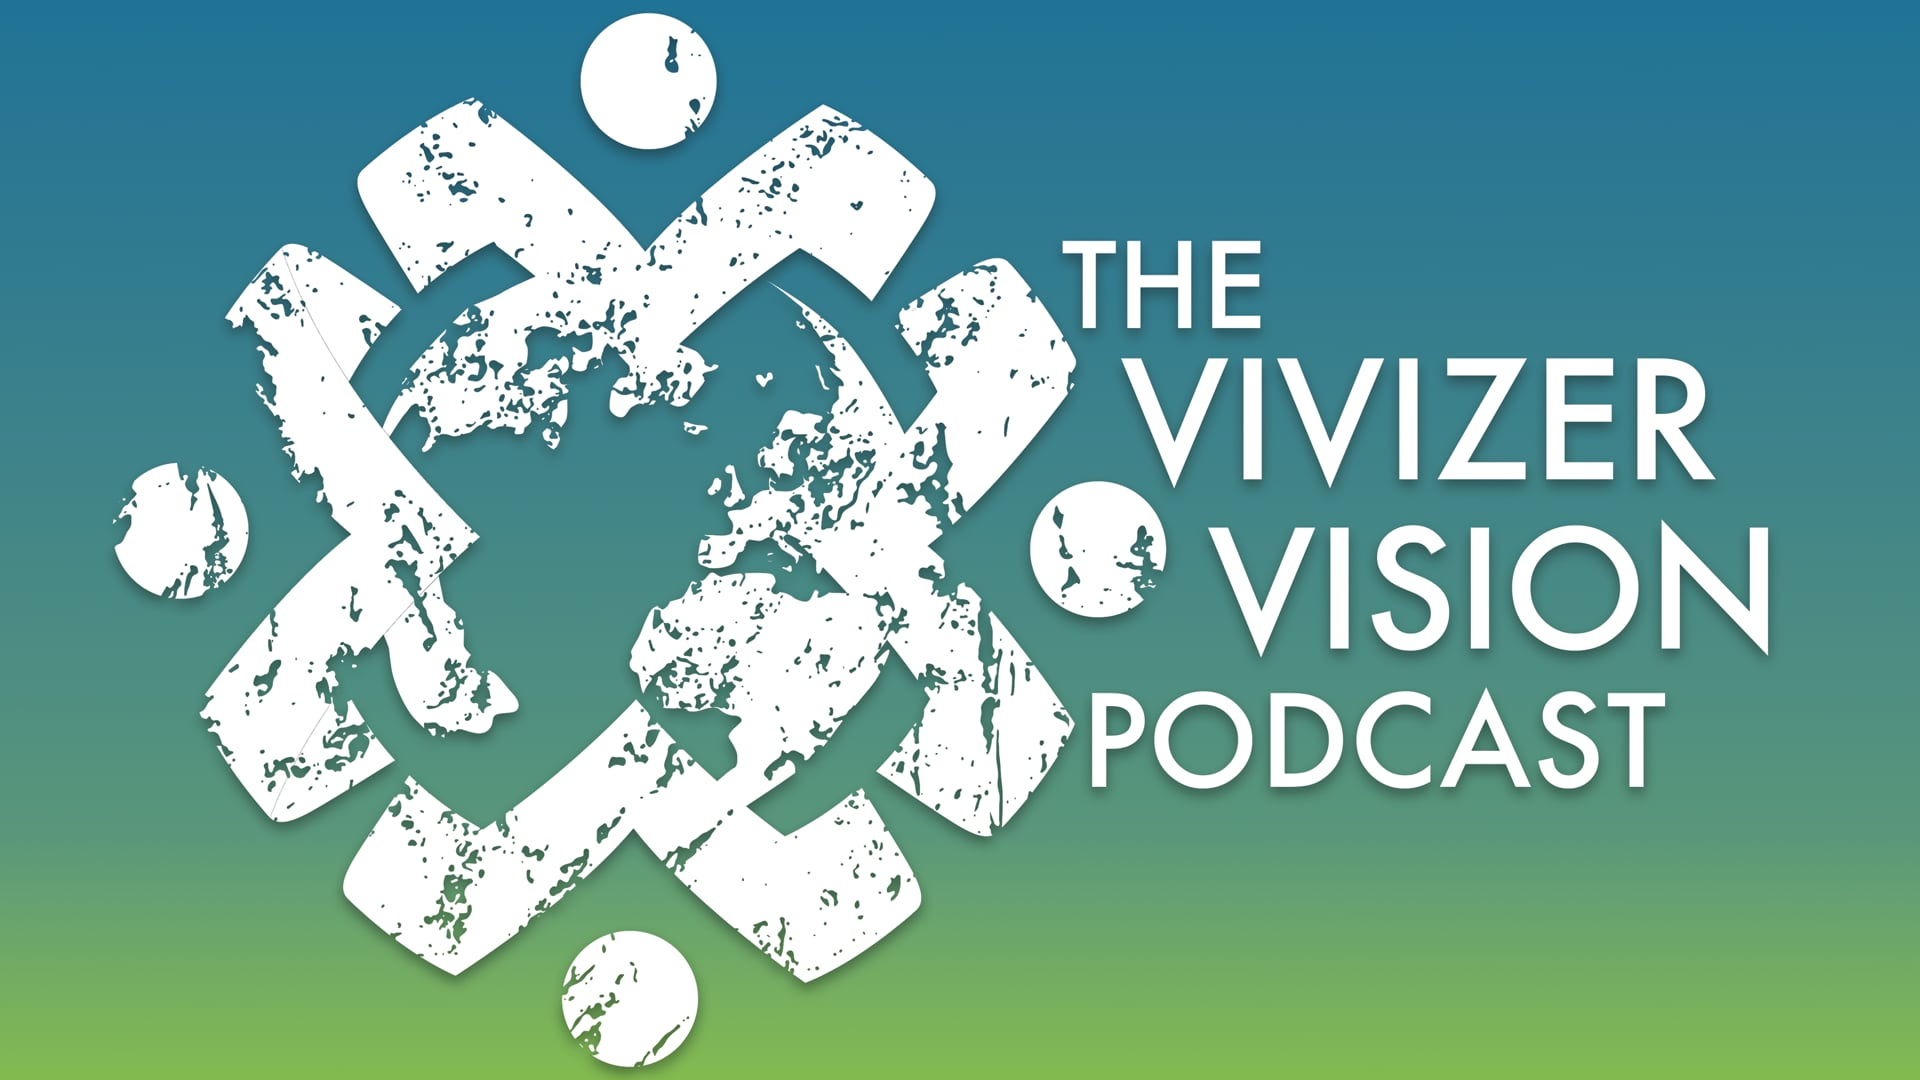 The Vivizer Vision Podcast Episode 4